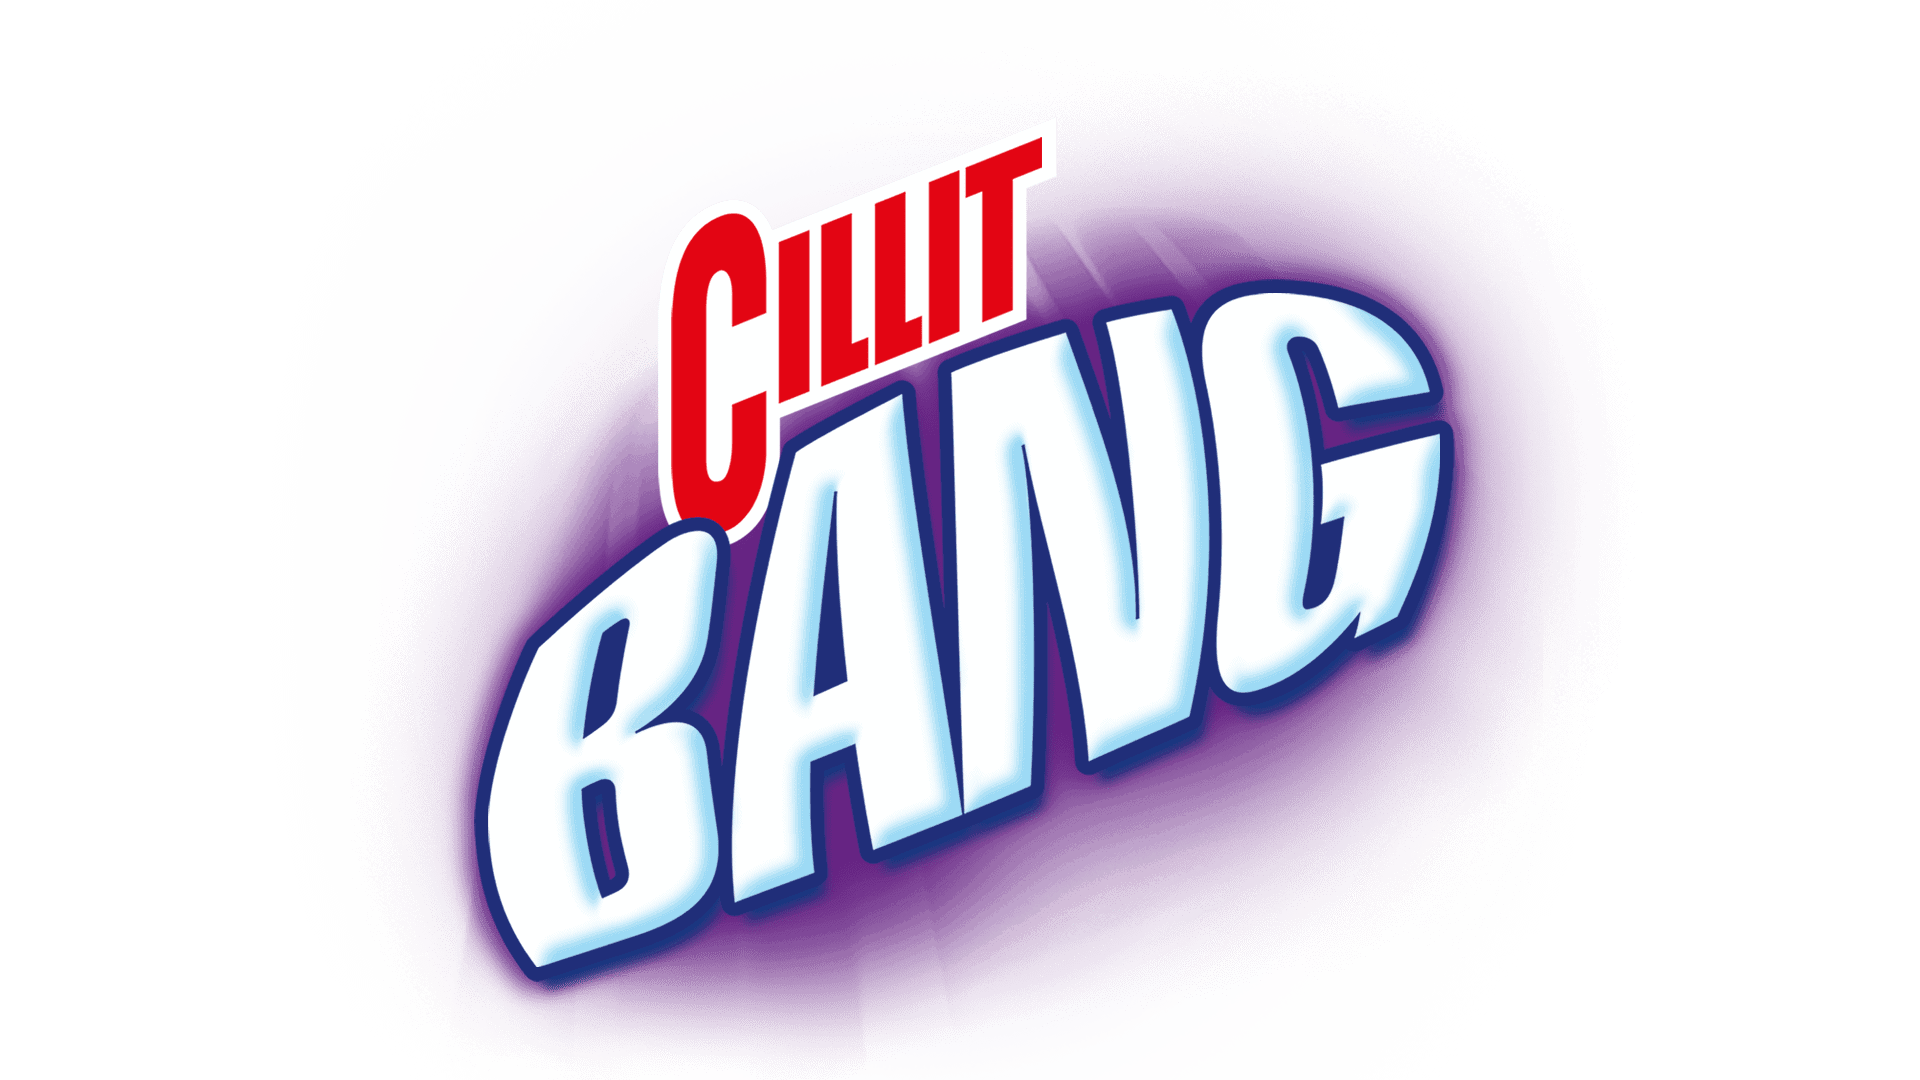 Cillit Bang packaging design